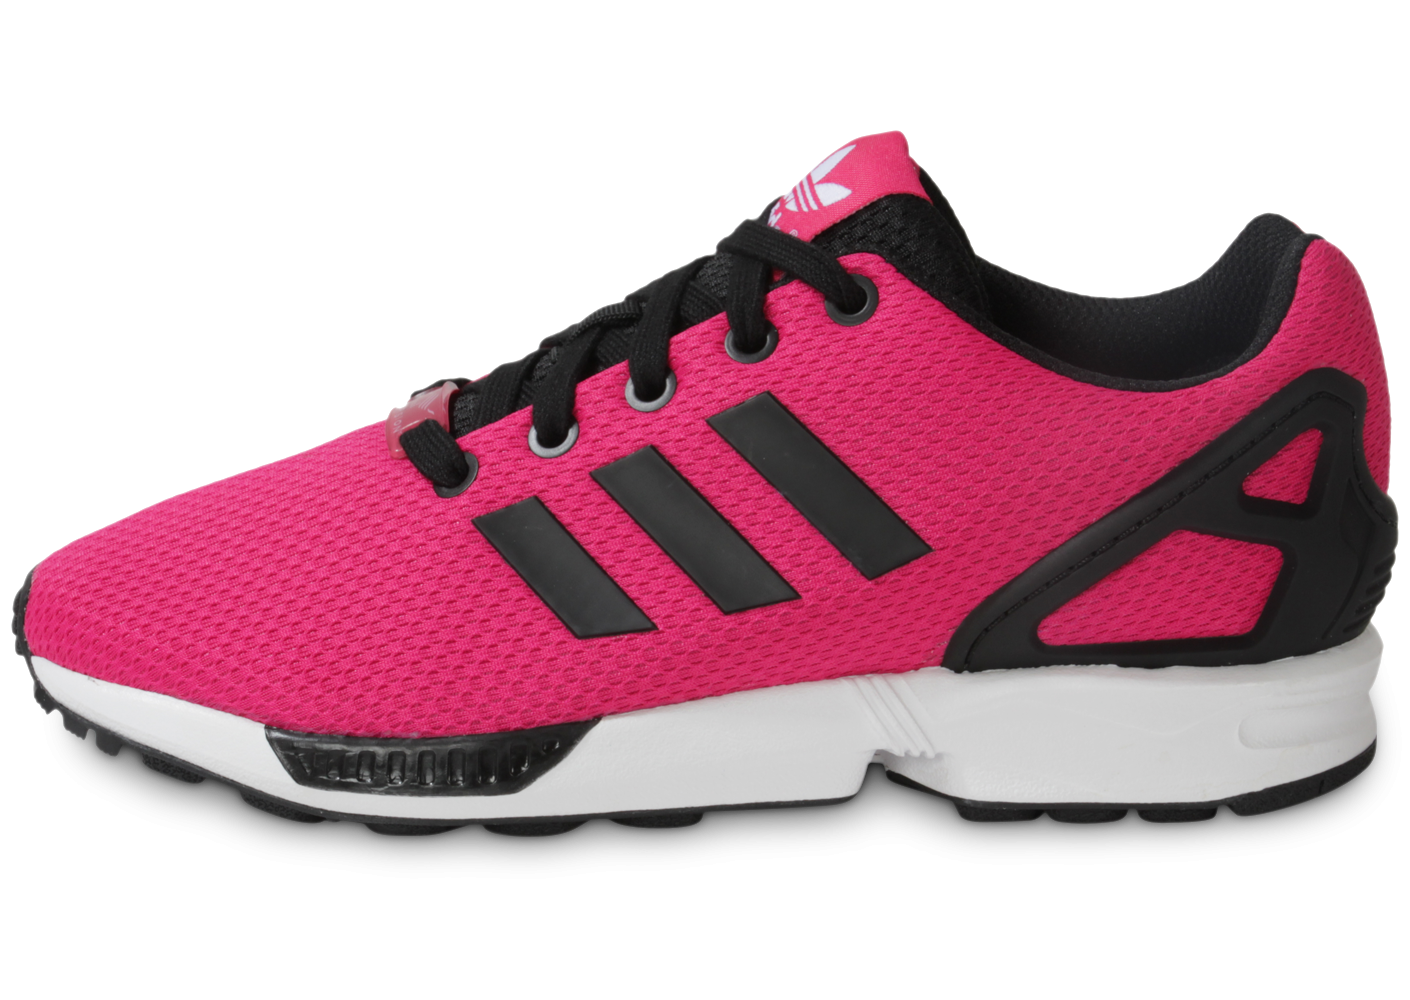 adidas zx flux femme rose fushia